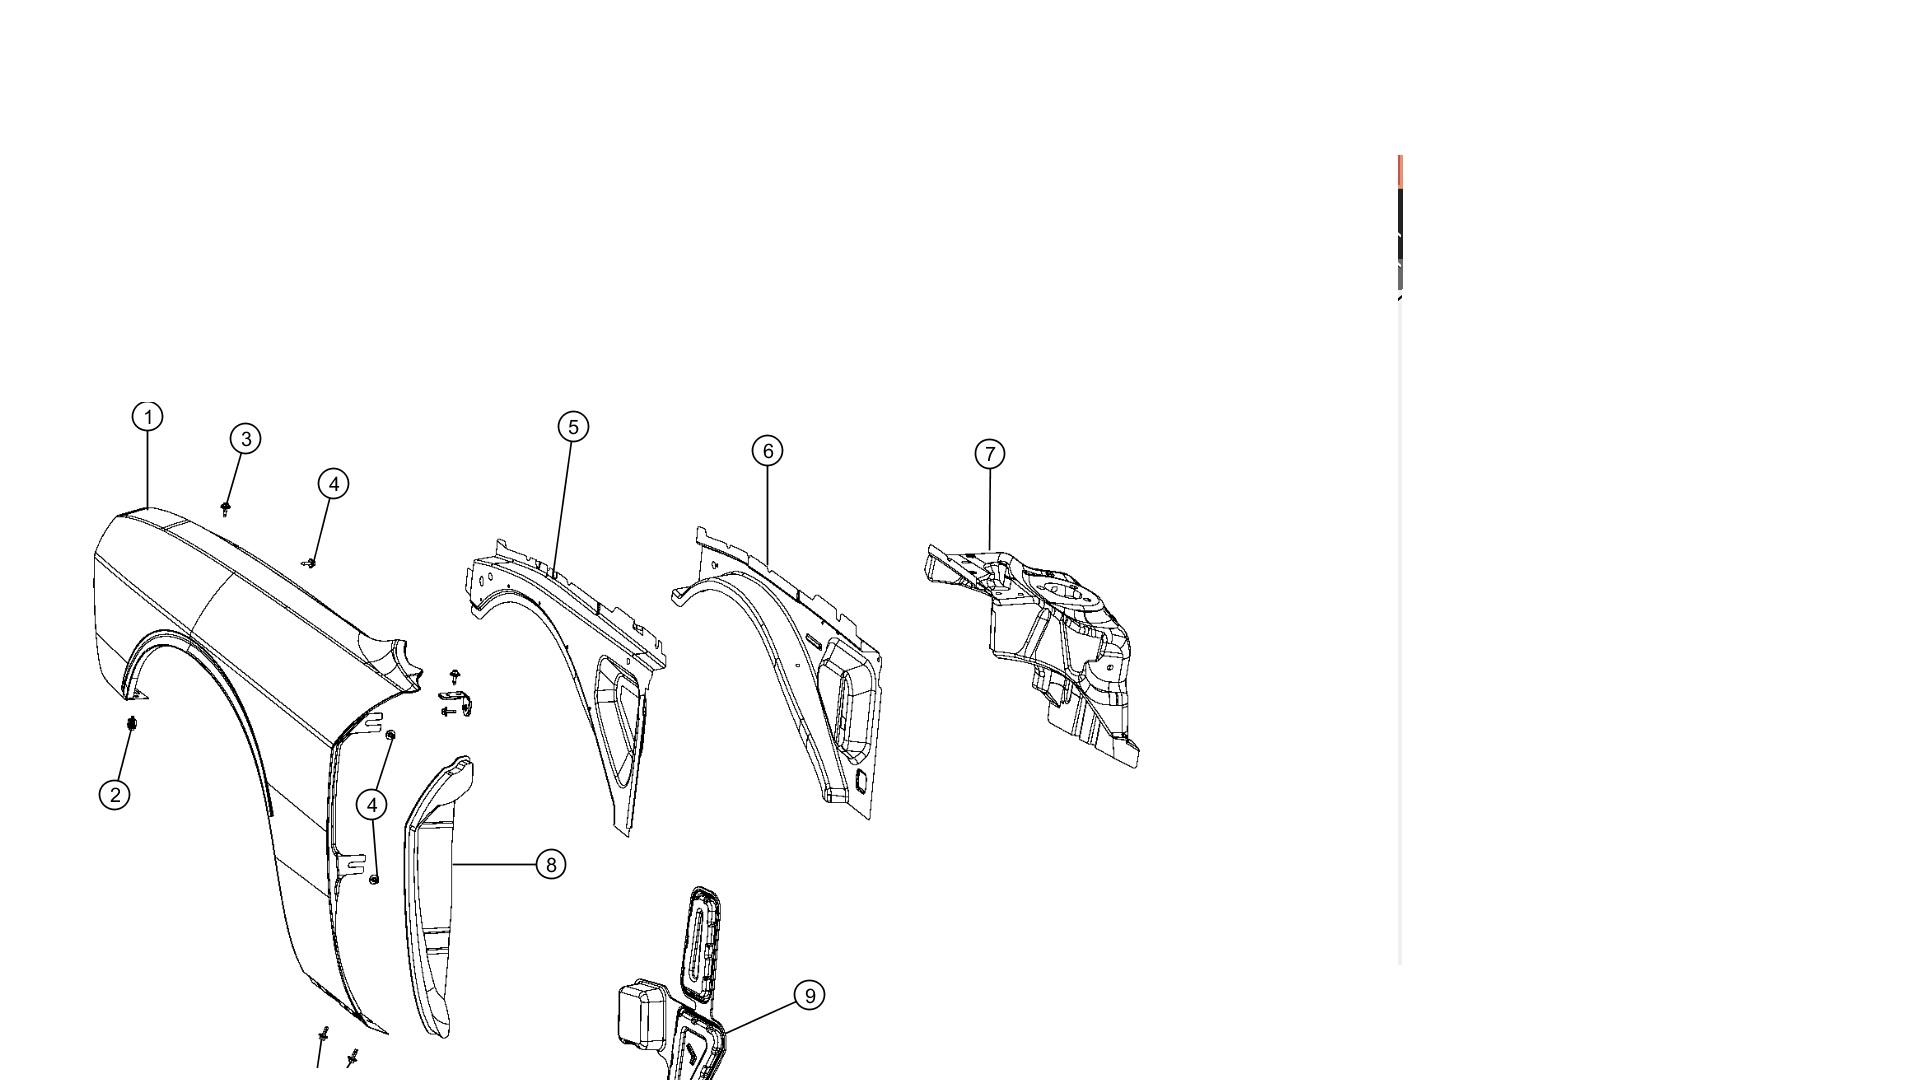 6e7a76d6-7364-4720-ab22-de3e273d9873_challenger front fender.jpg